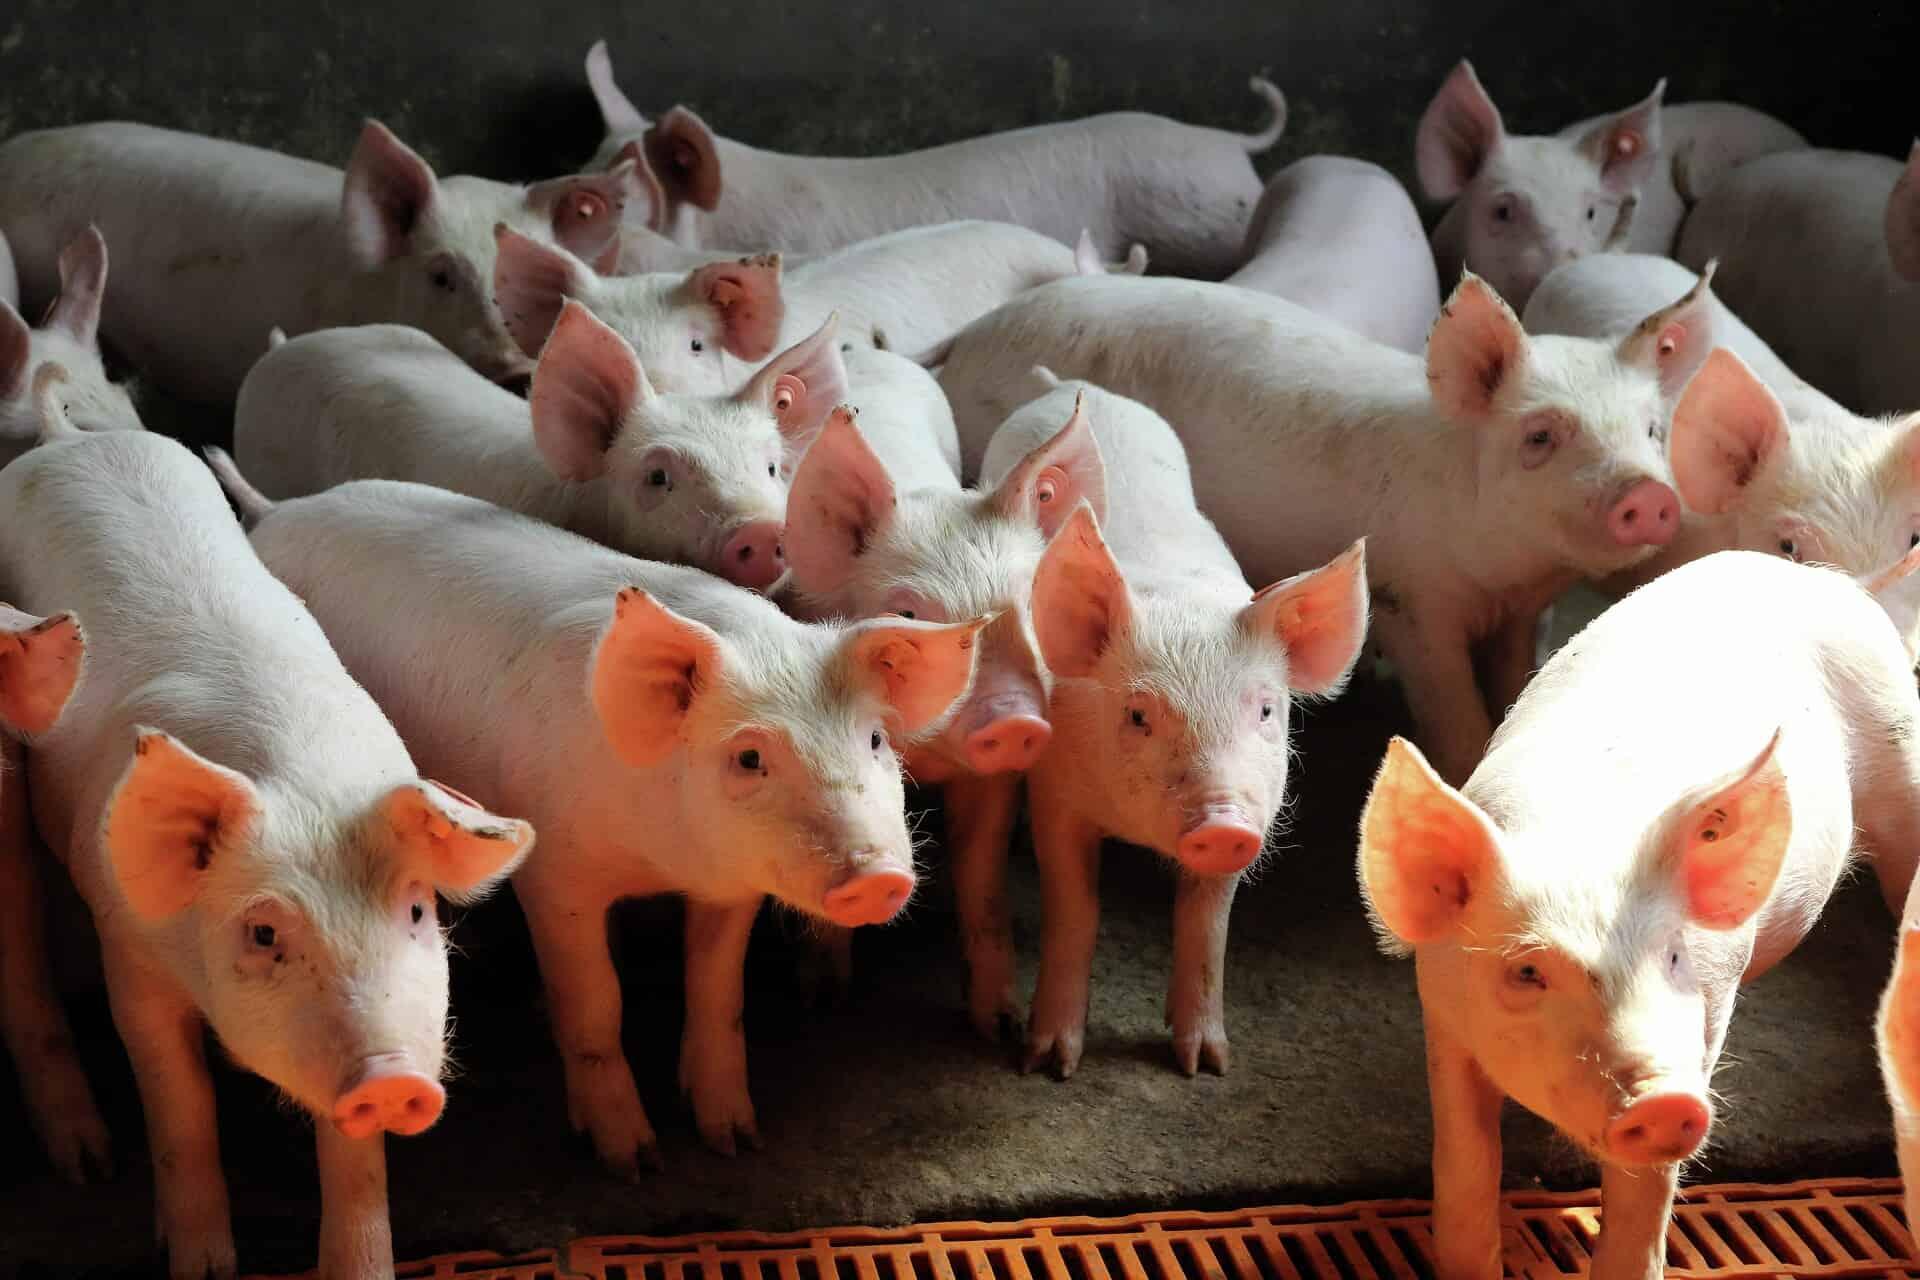 suínos, suinocultura brasileira, produção, carne suína